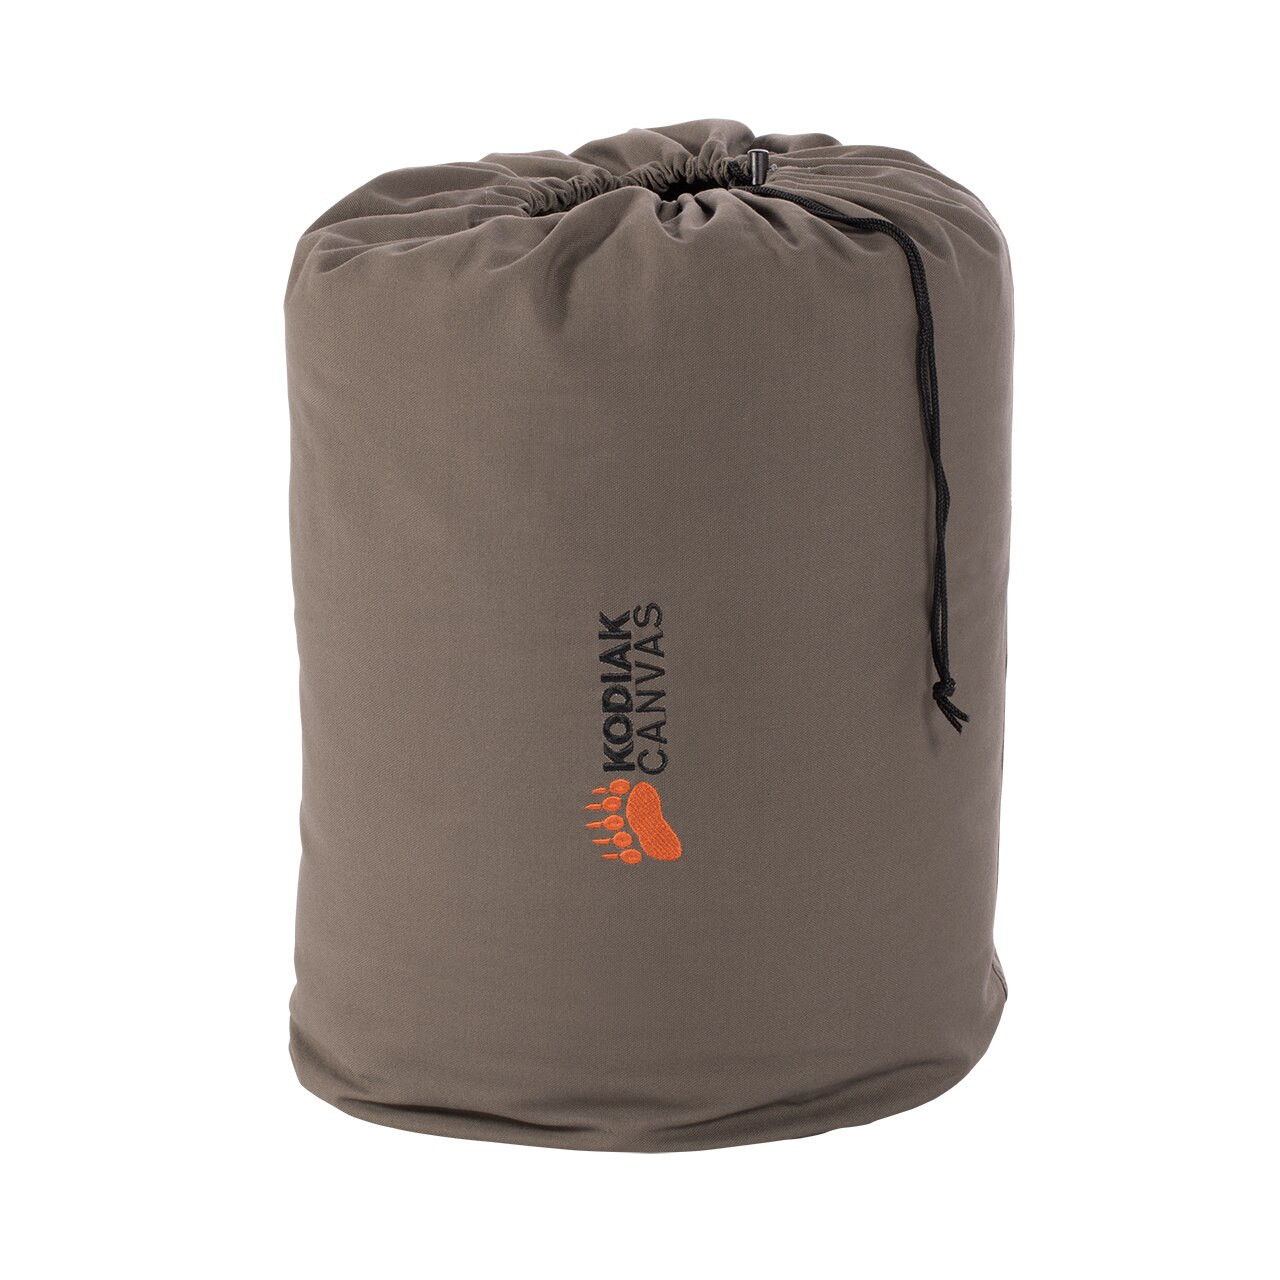 Handy Storage Bag